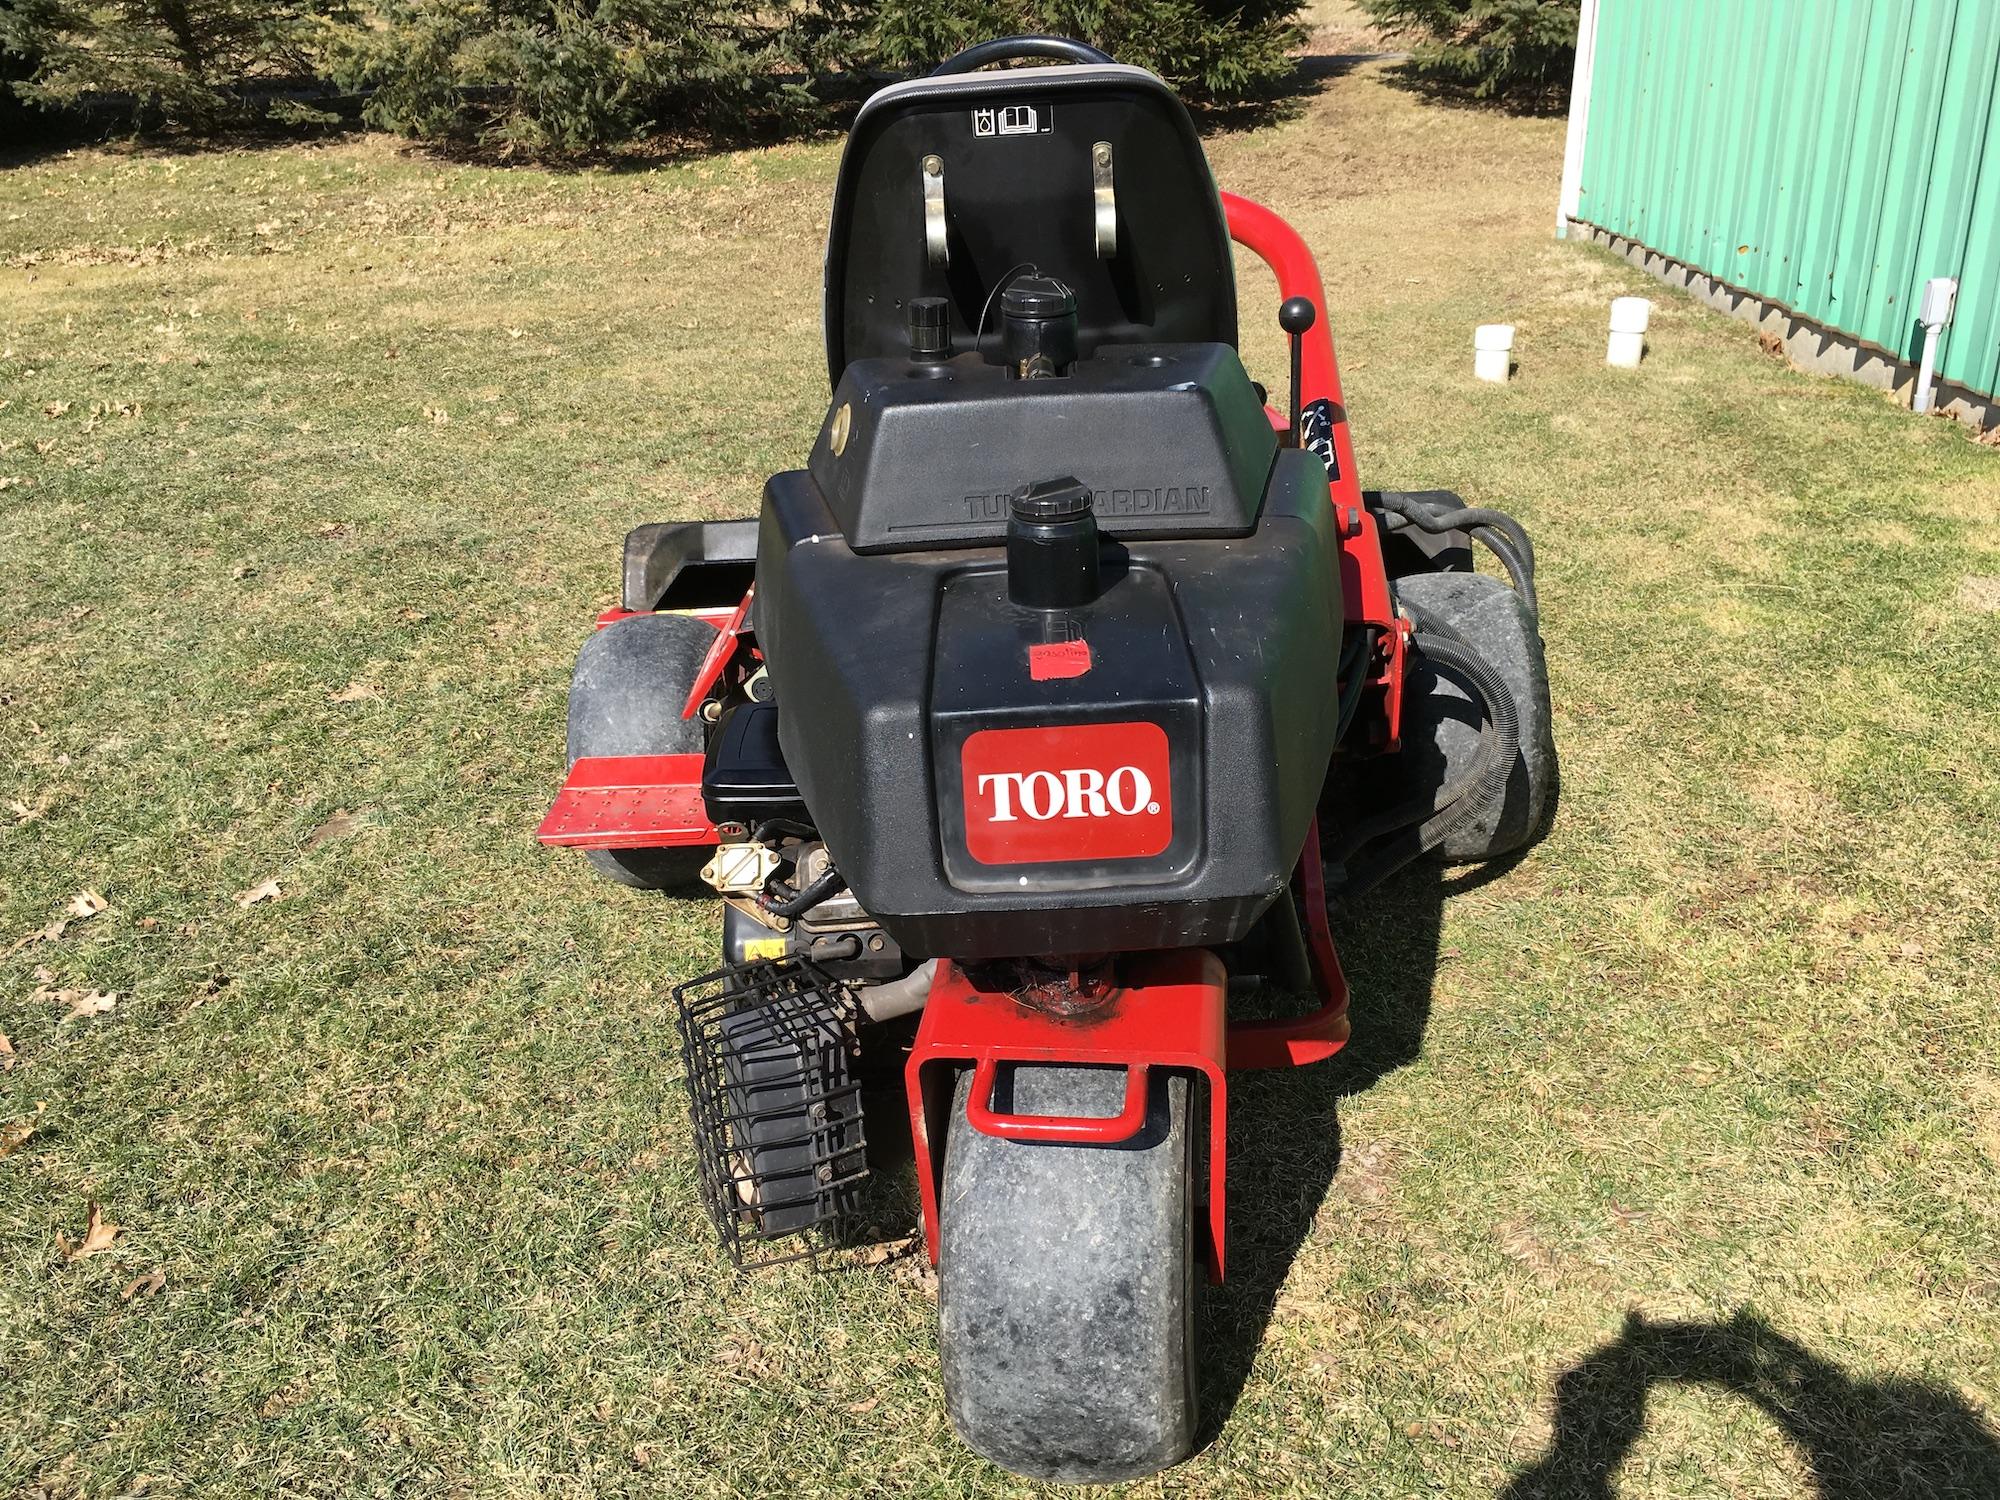 Toro-3100-Triplex-Greensmaster-Mower-04